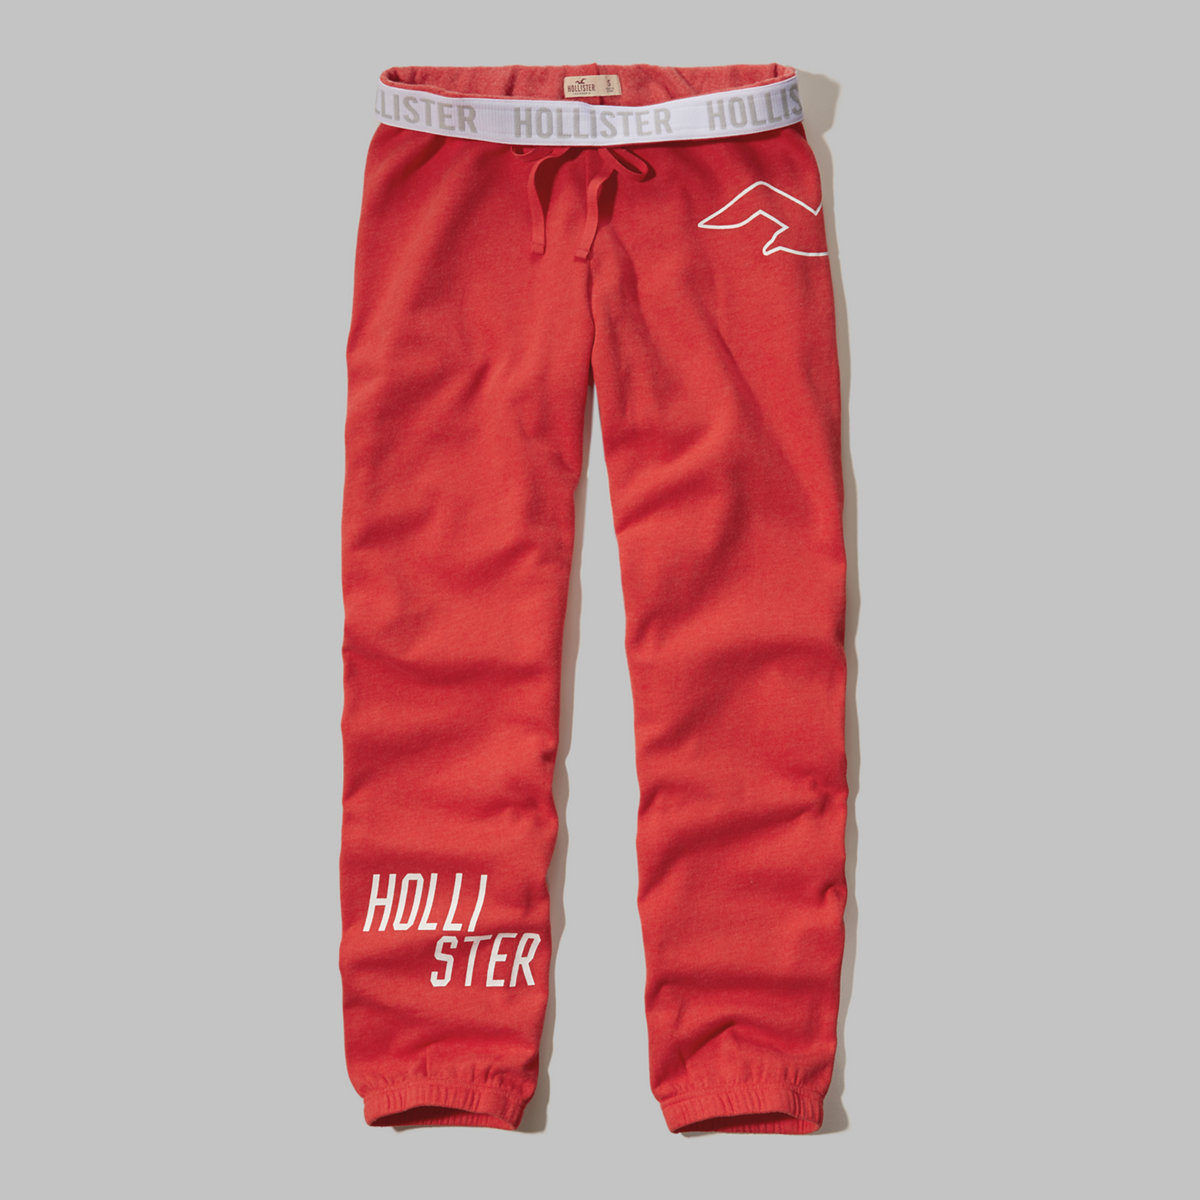 Hollister Banded Boyfriend Sweatpants